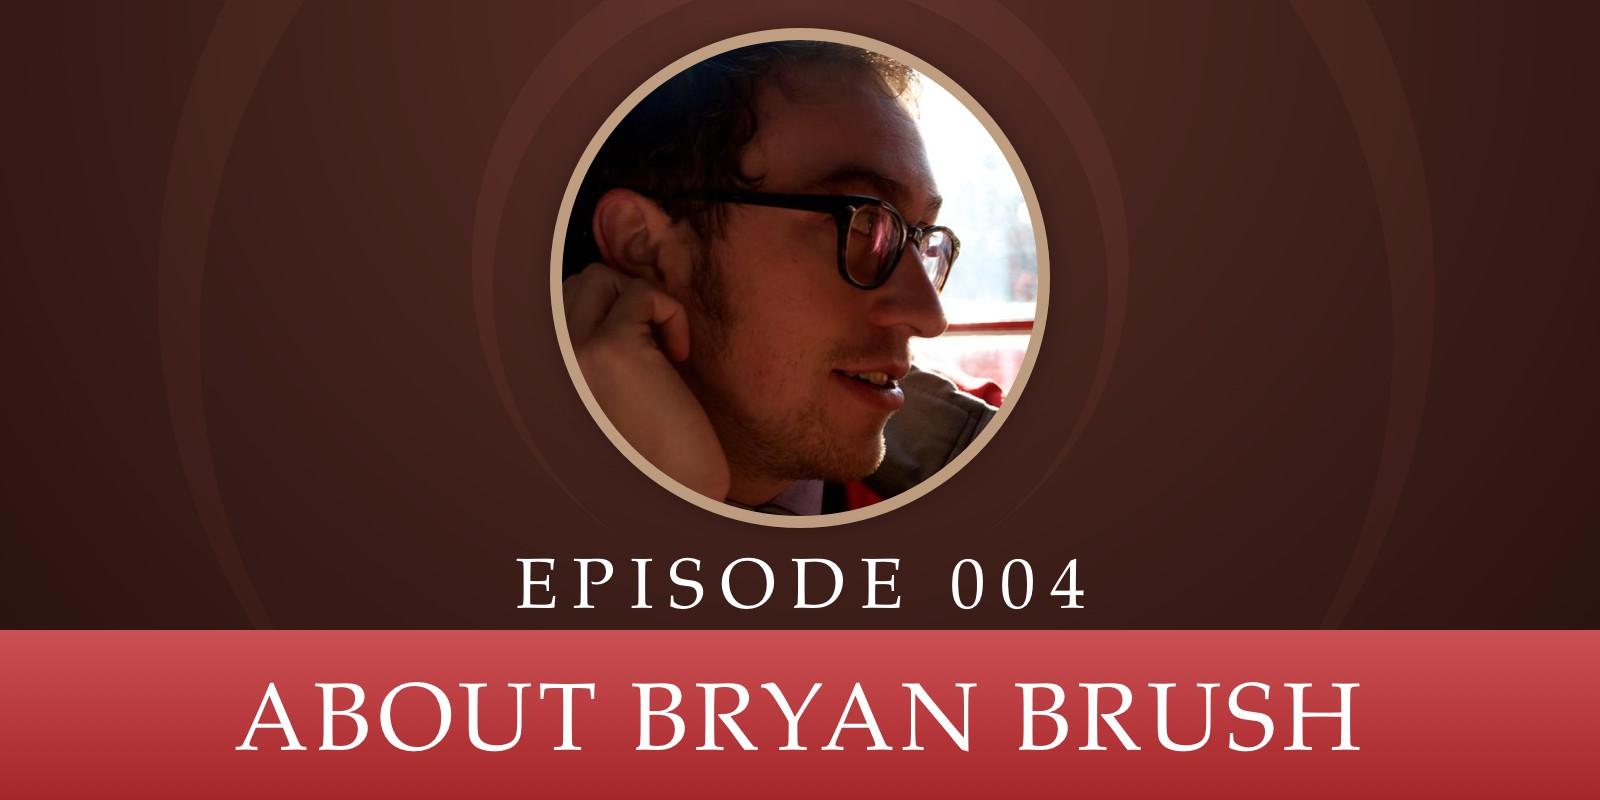 Episode 004: About Bryan Brush